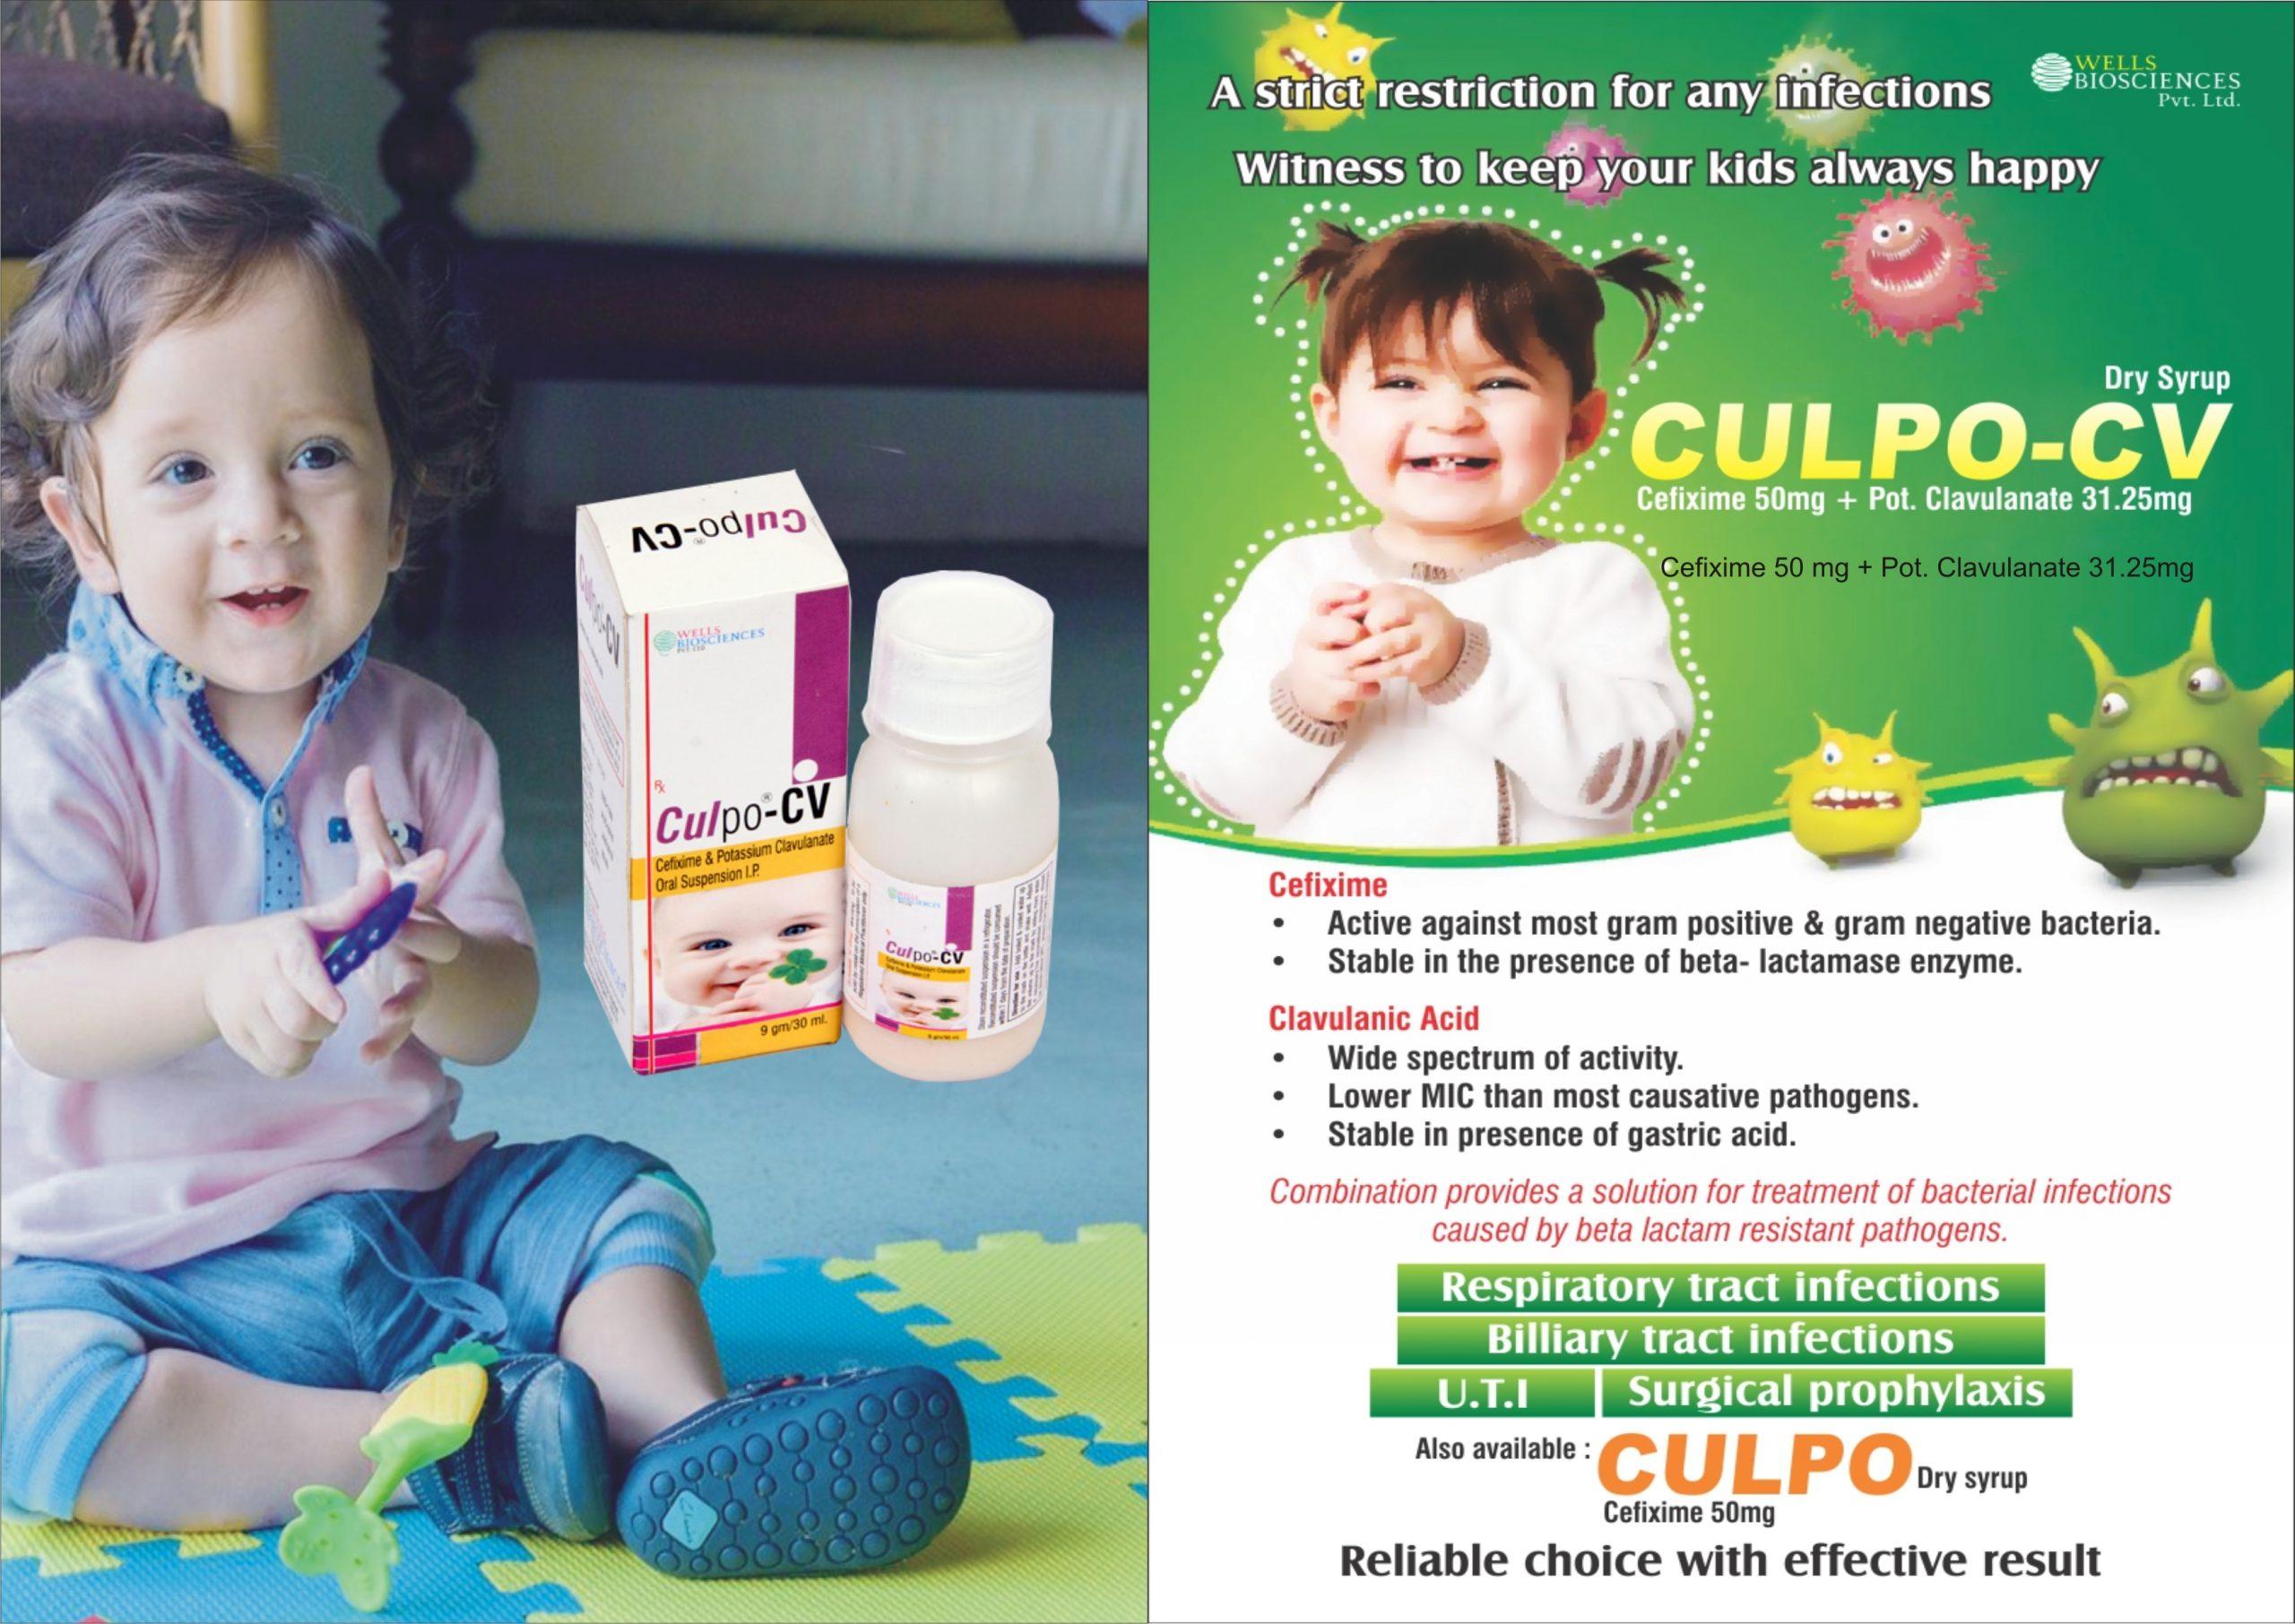 culpo-cv dry syrup